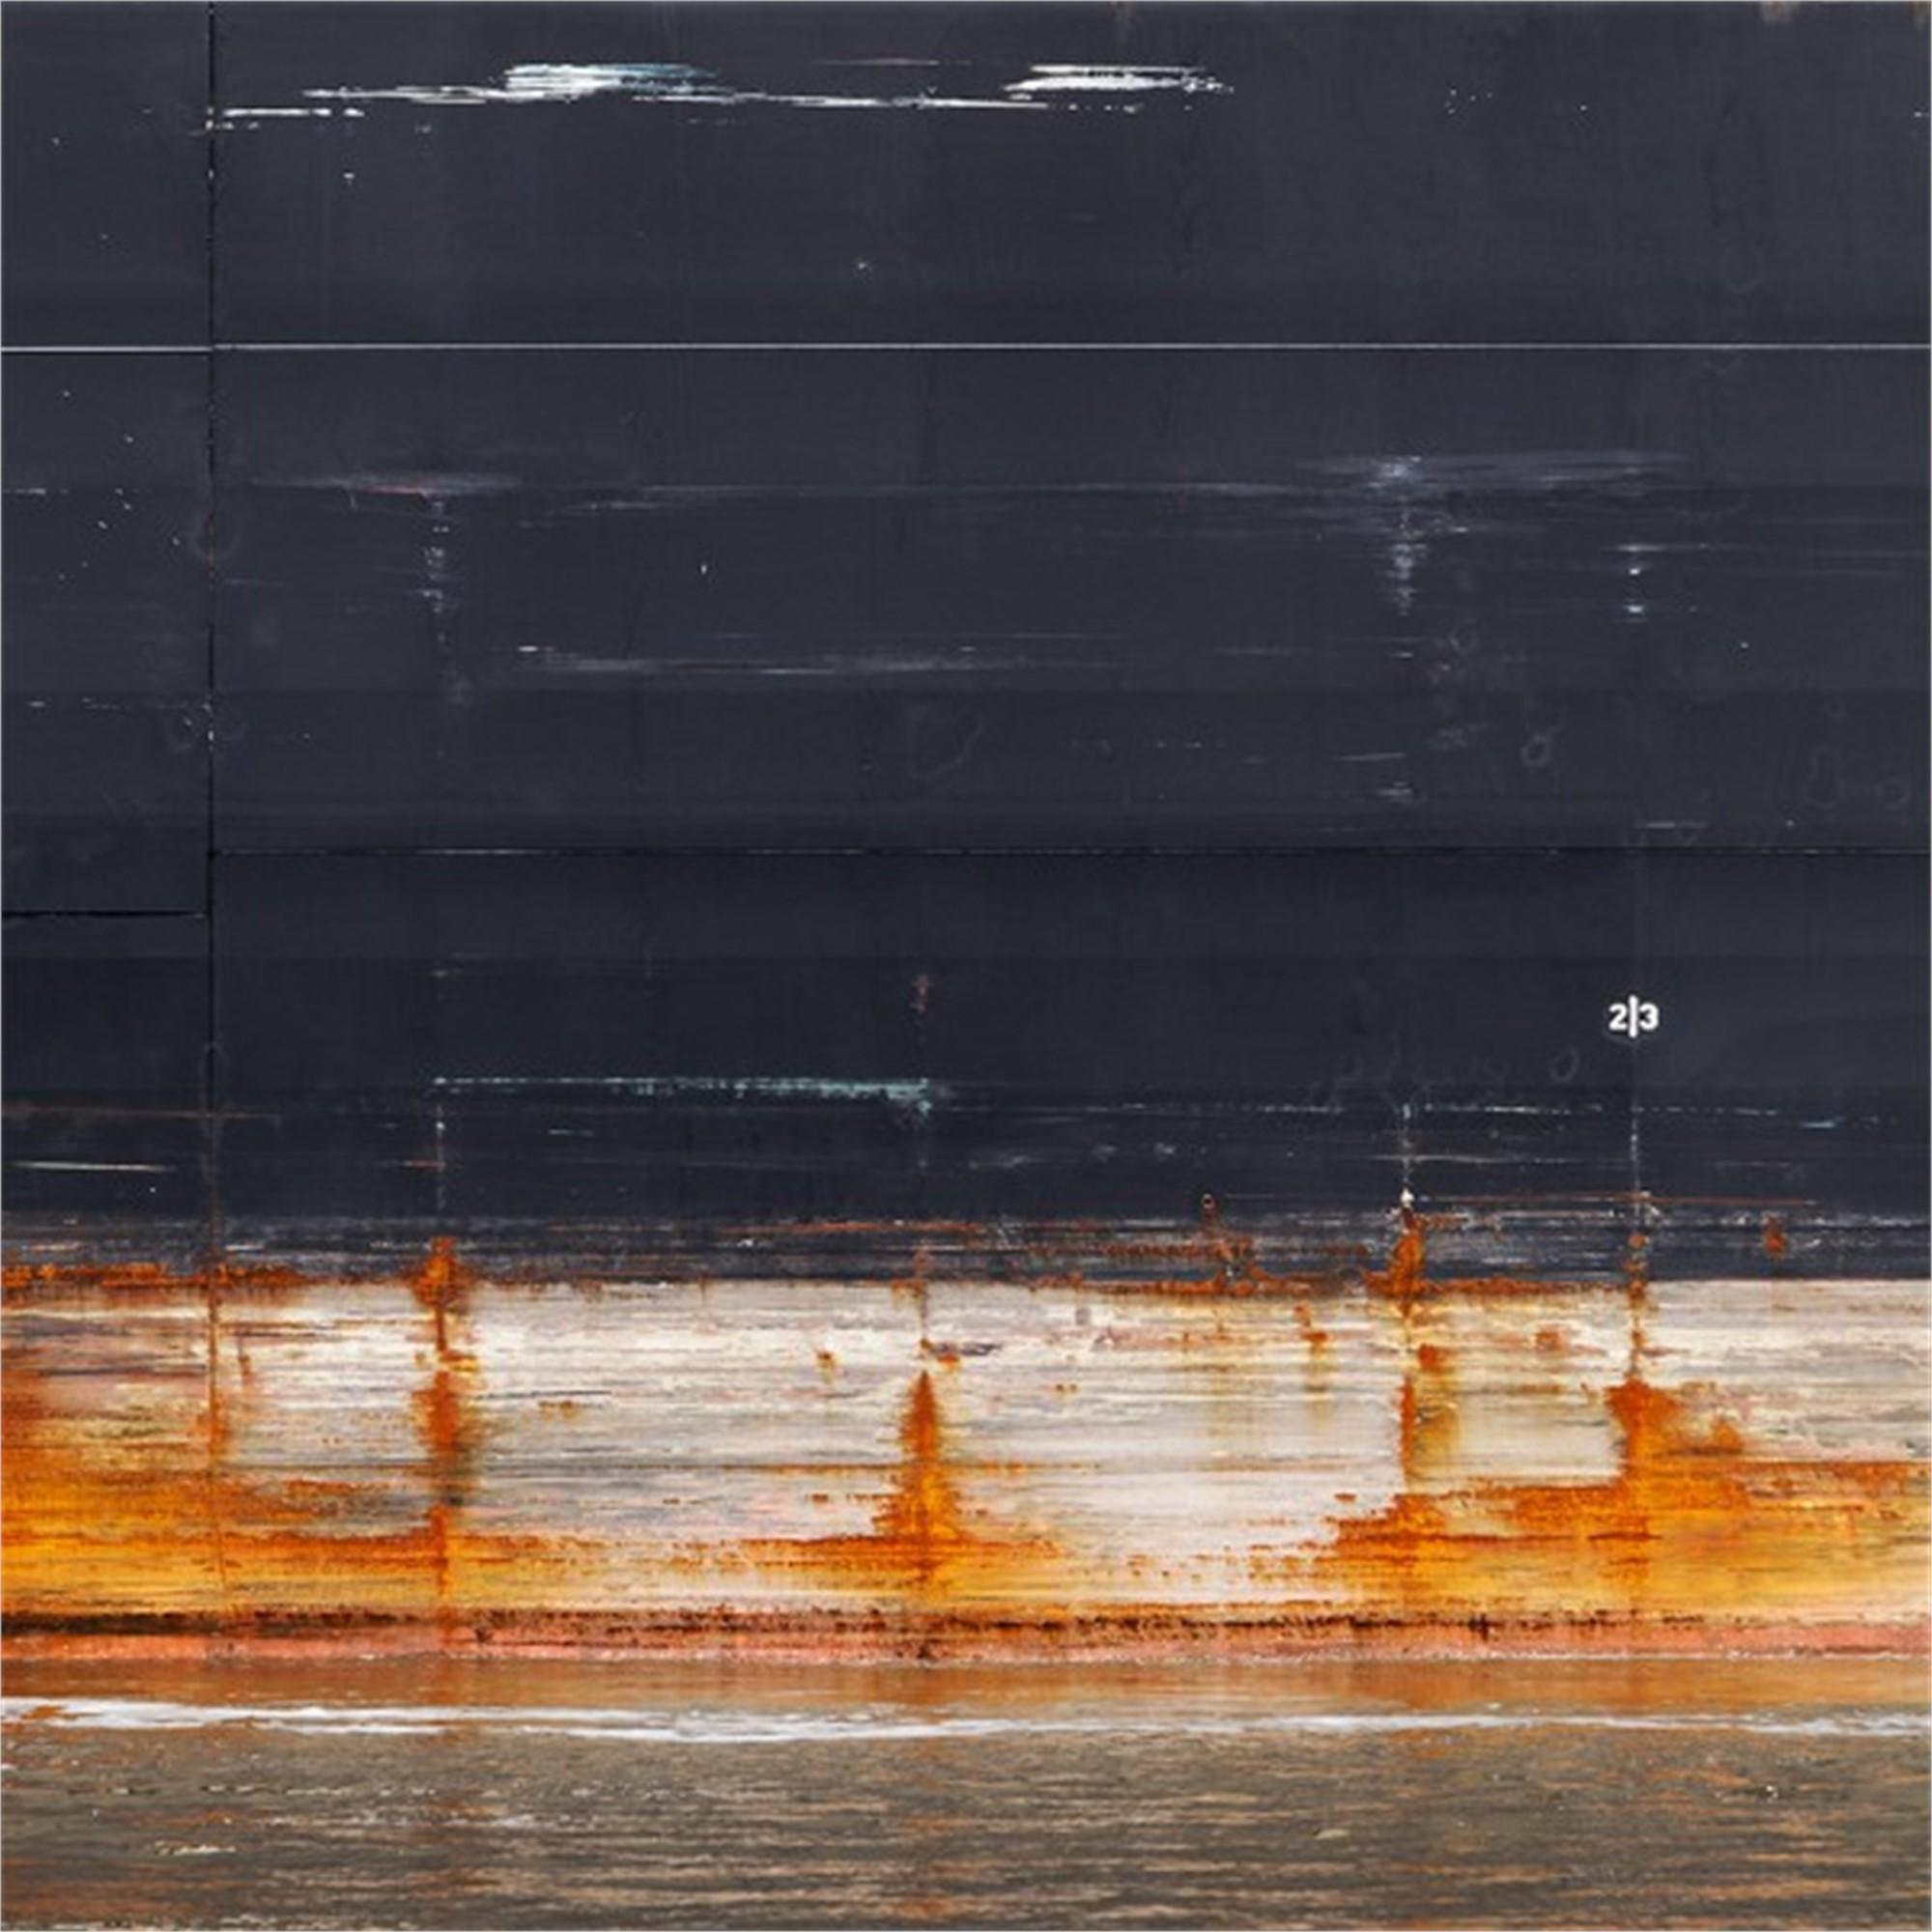 Rothko Series 2: 2|3 by Dan Kaufman